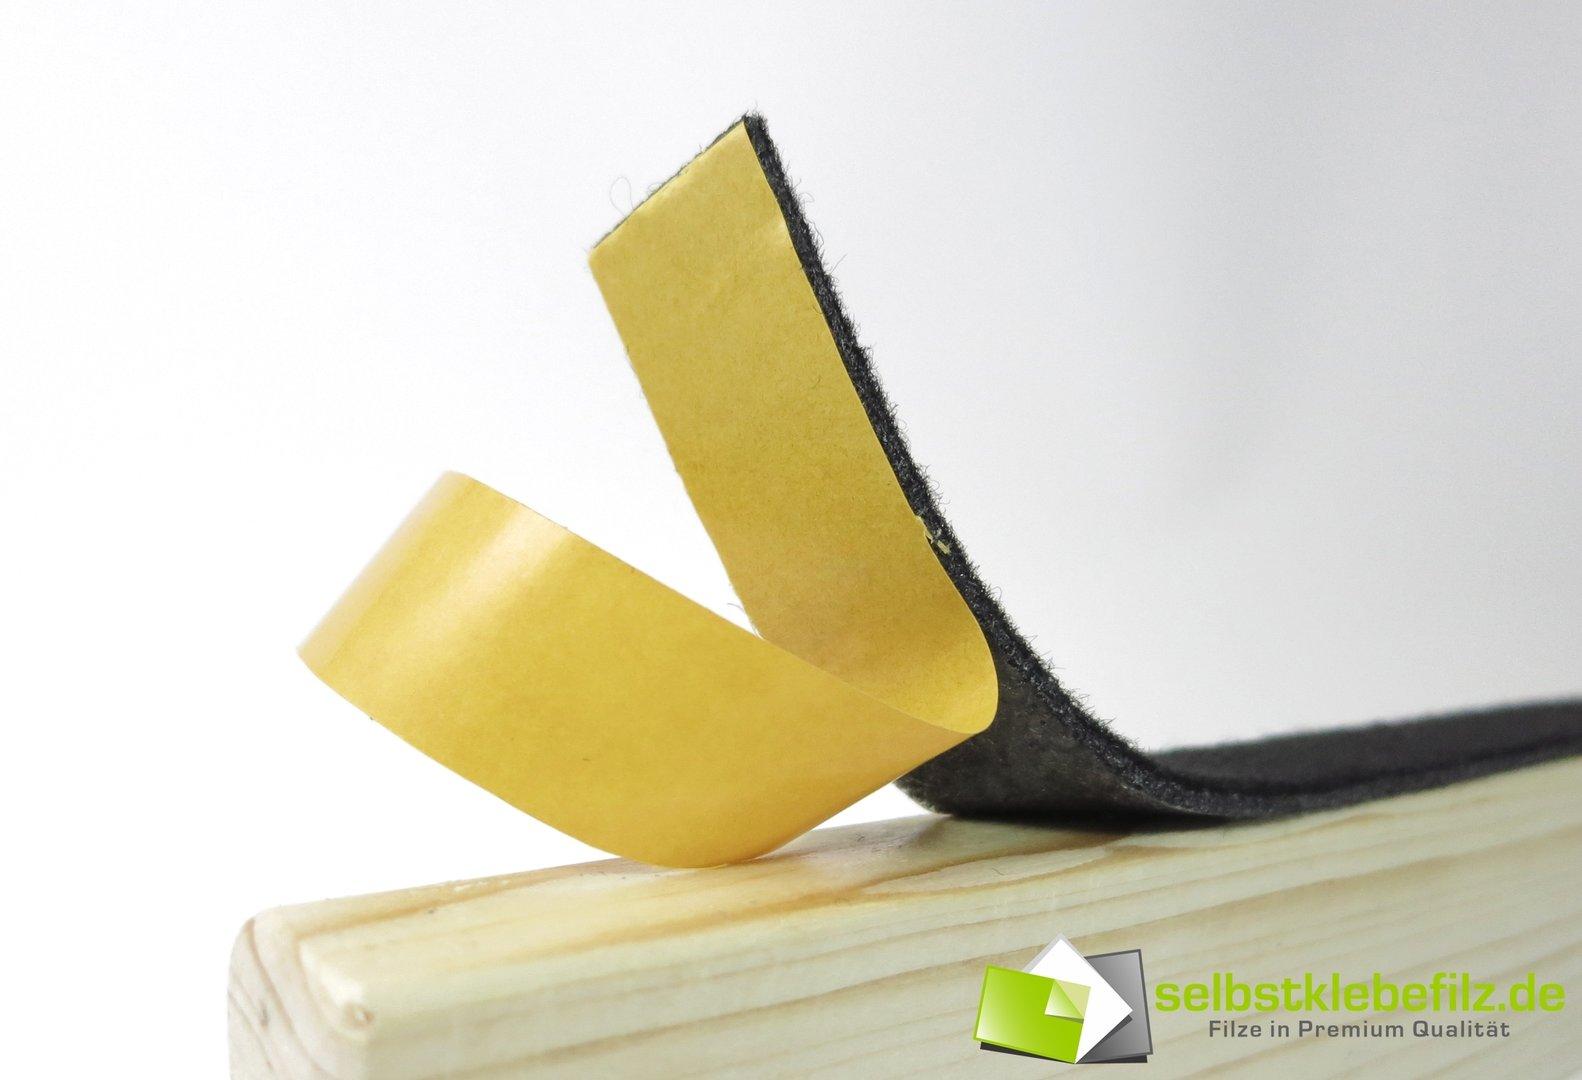 Filzstreifen 80mm Filzband weiß ab 1m 3mm dick stark selbstklebend